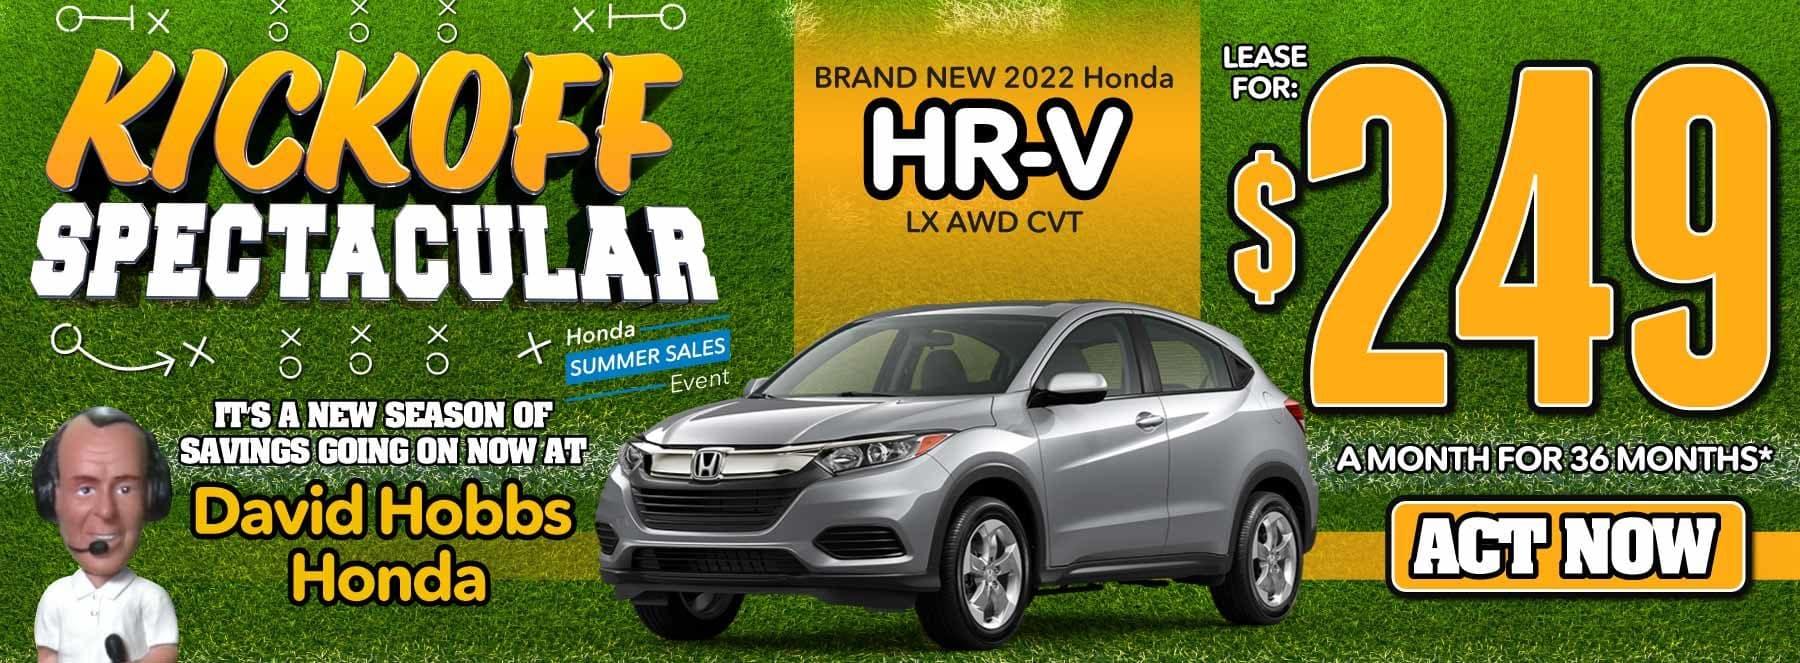 Brand New 2022 Honda HR-V LX AWD CVT - Lease for $249 for 36 Mos. — ACT NOW